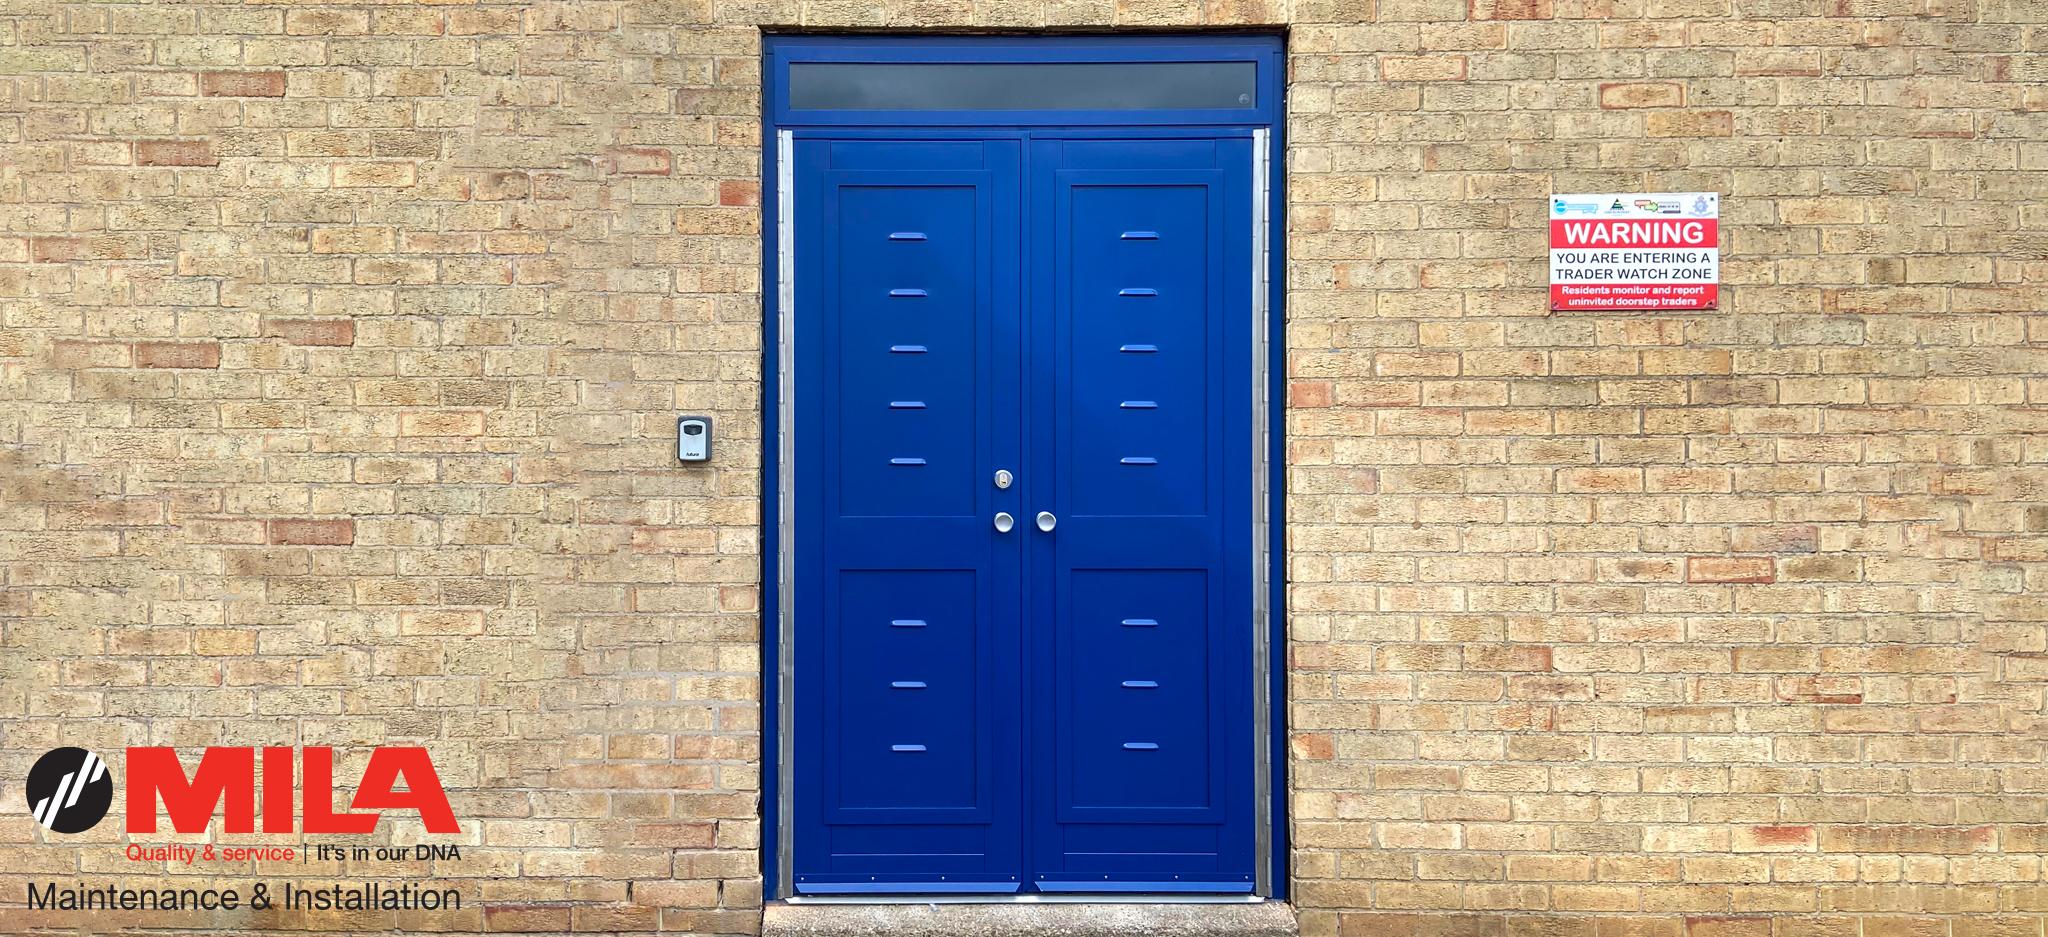 blue bin store door on a brick wall with Mila Maintenance & Installations Logo